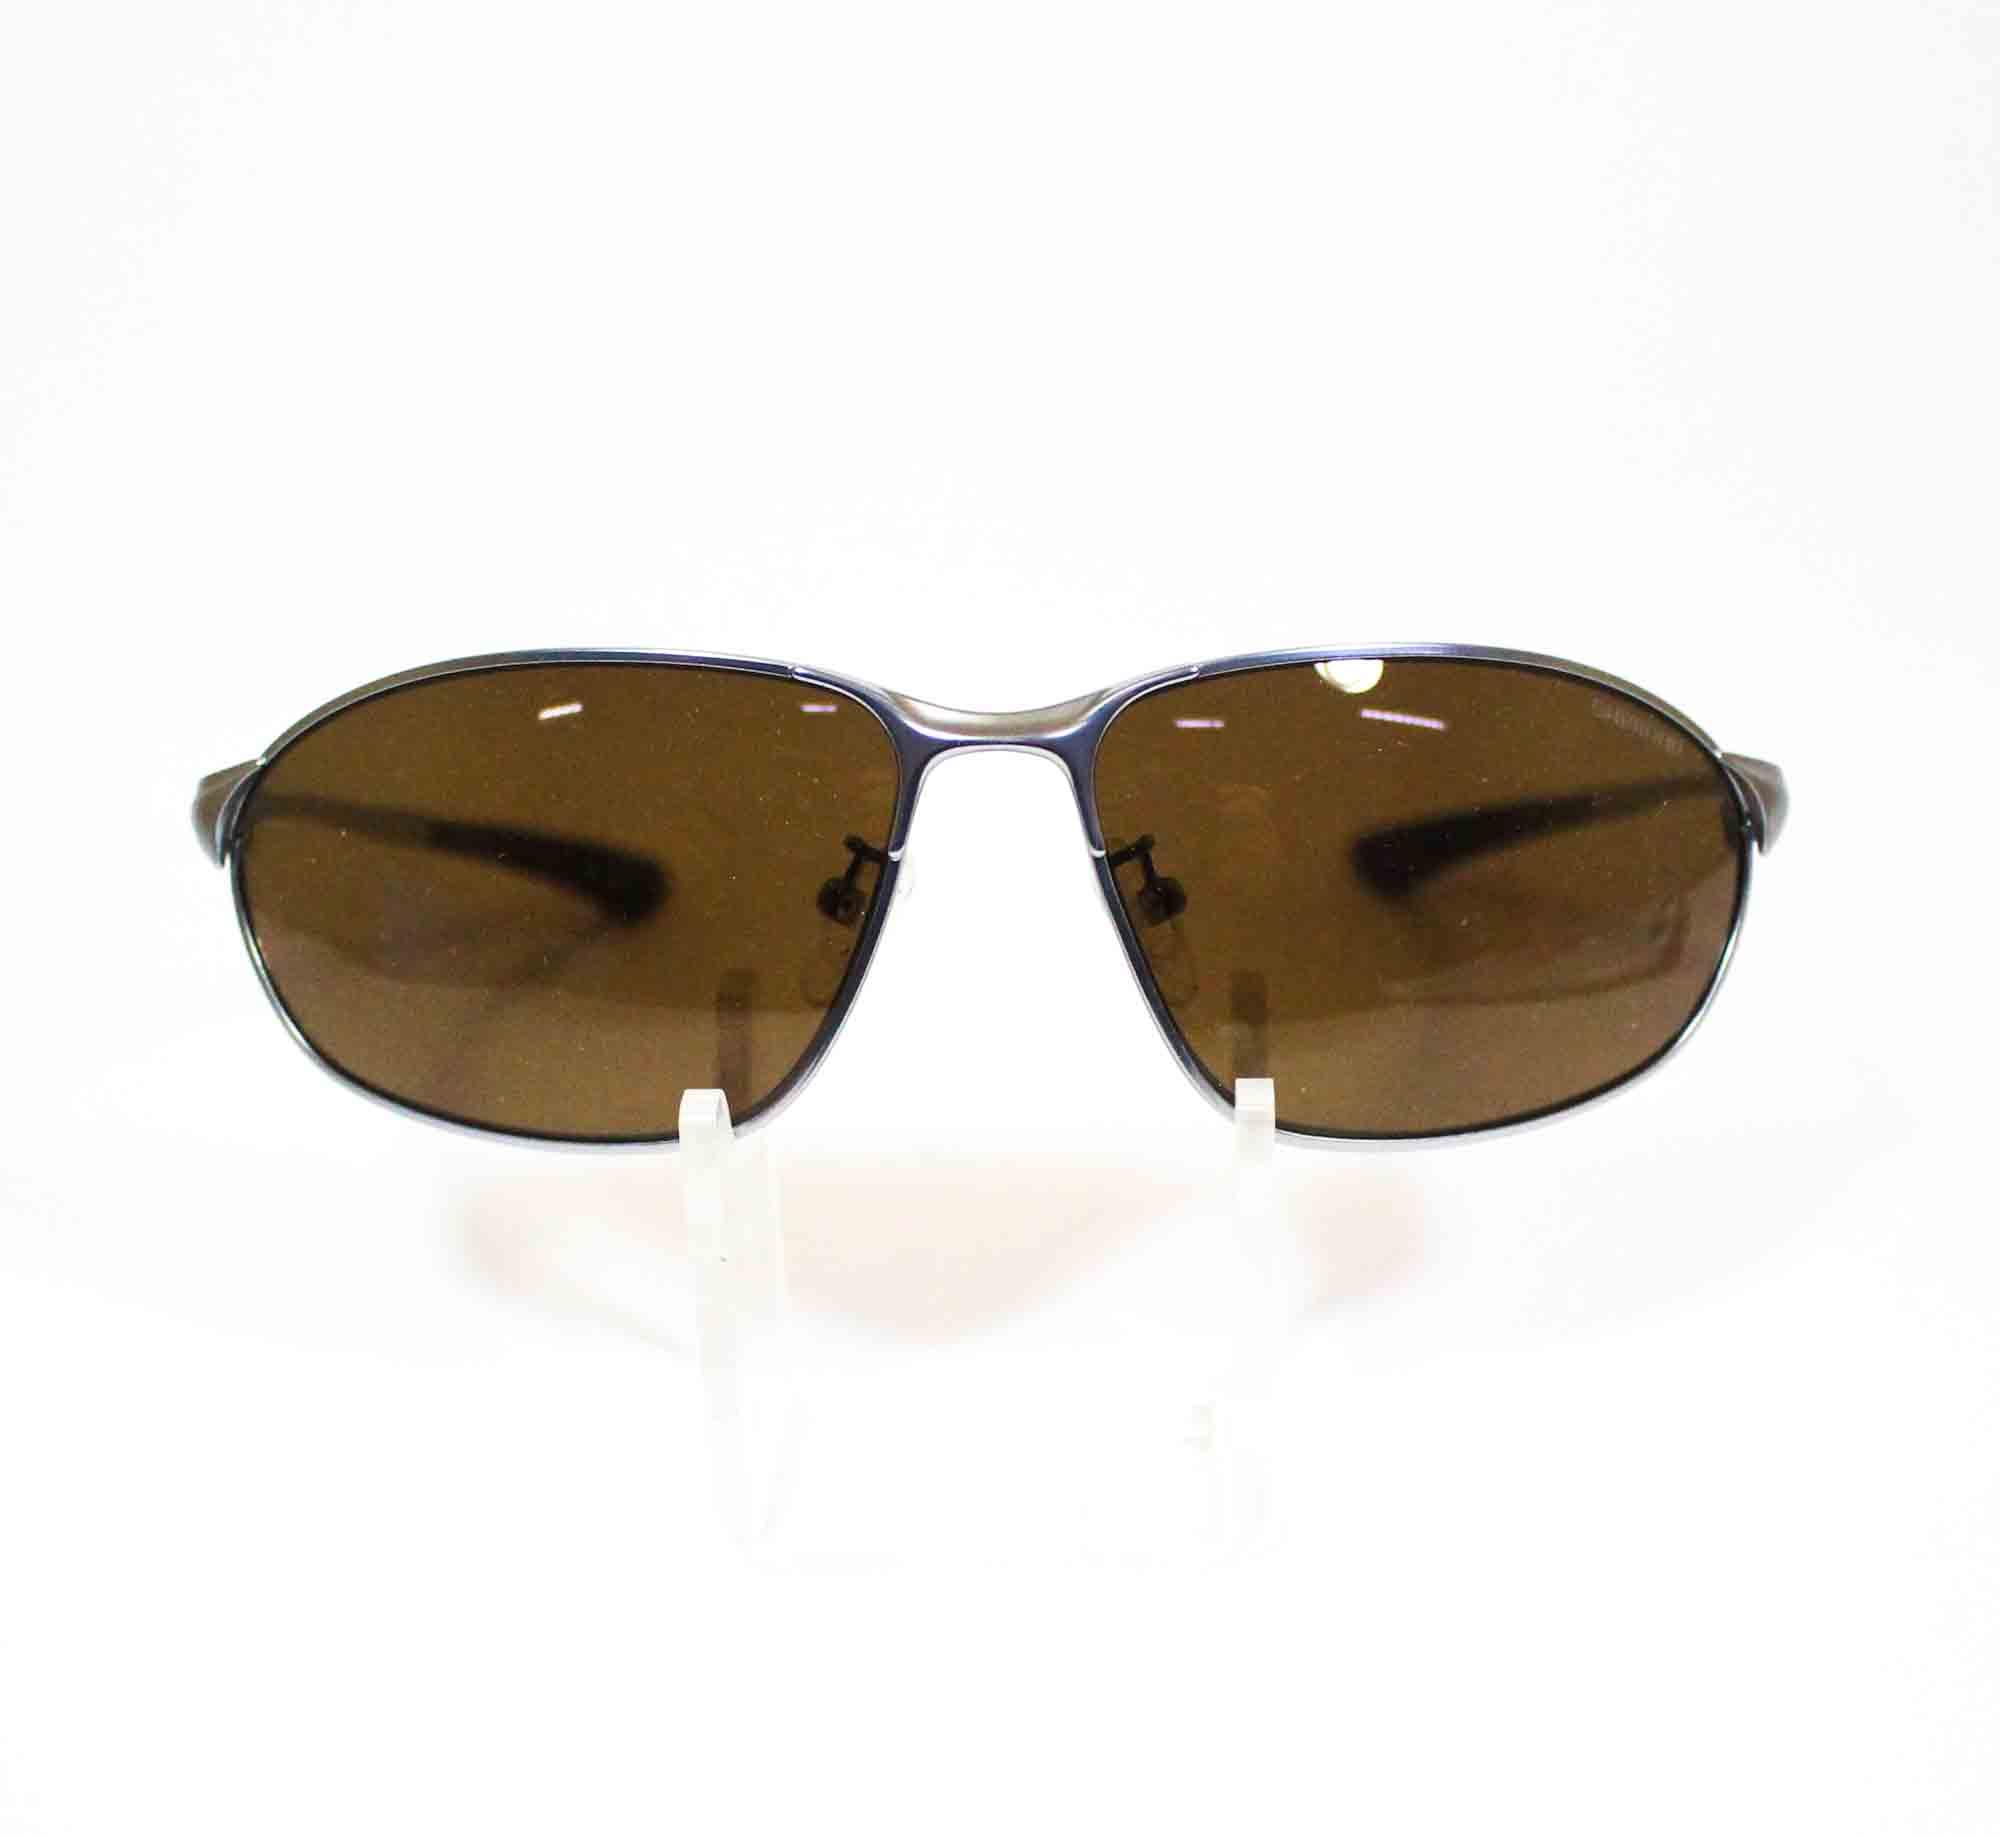 Shimano HG-063M Sunglasses Polarised Metal Frame Brown (8269)